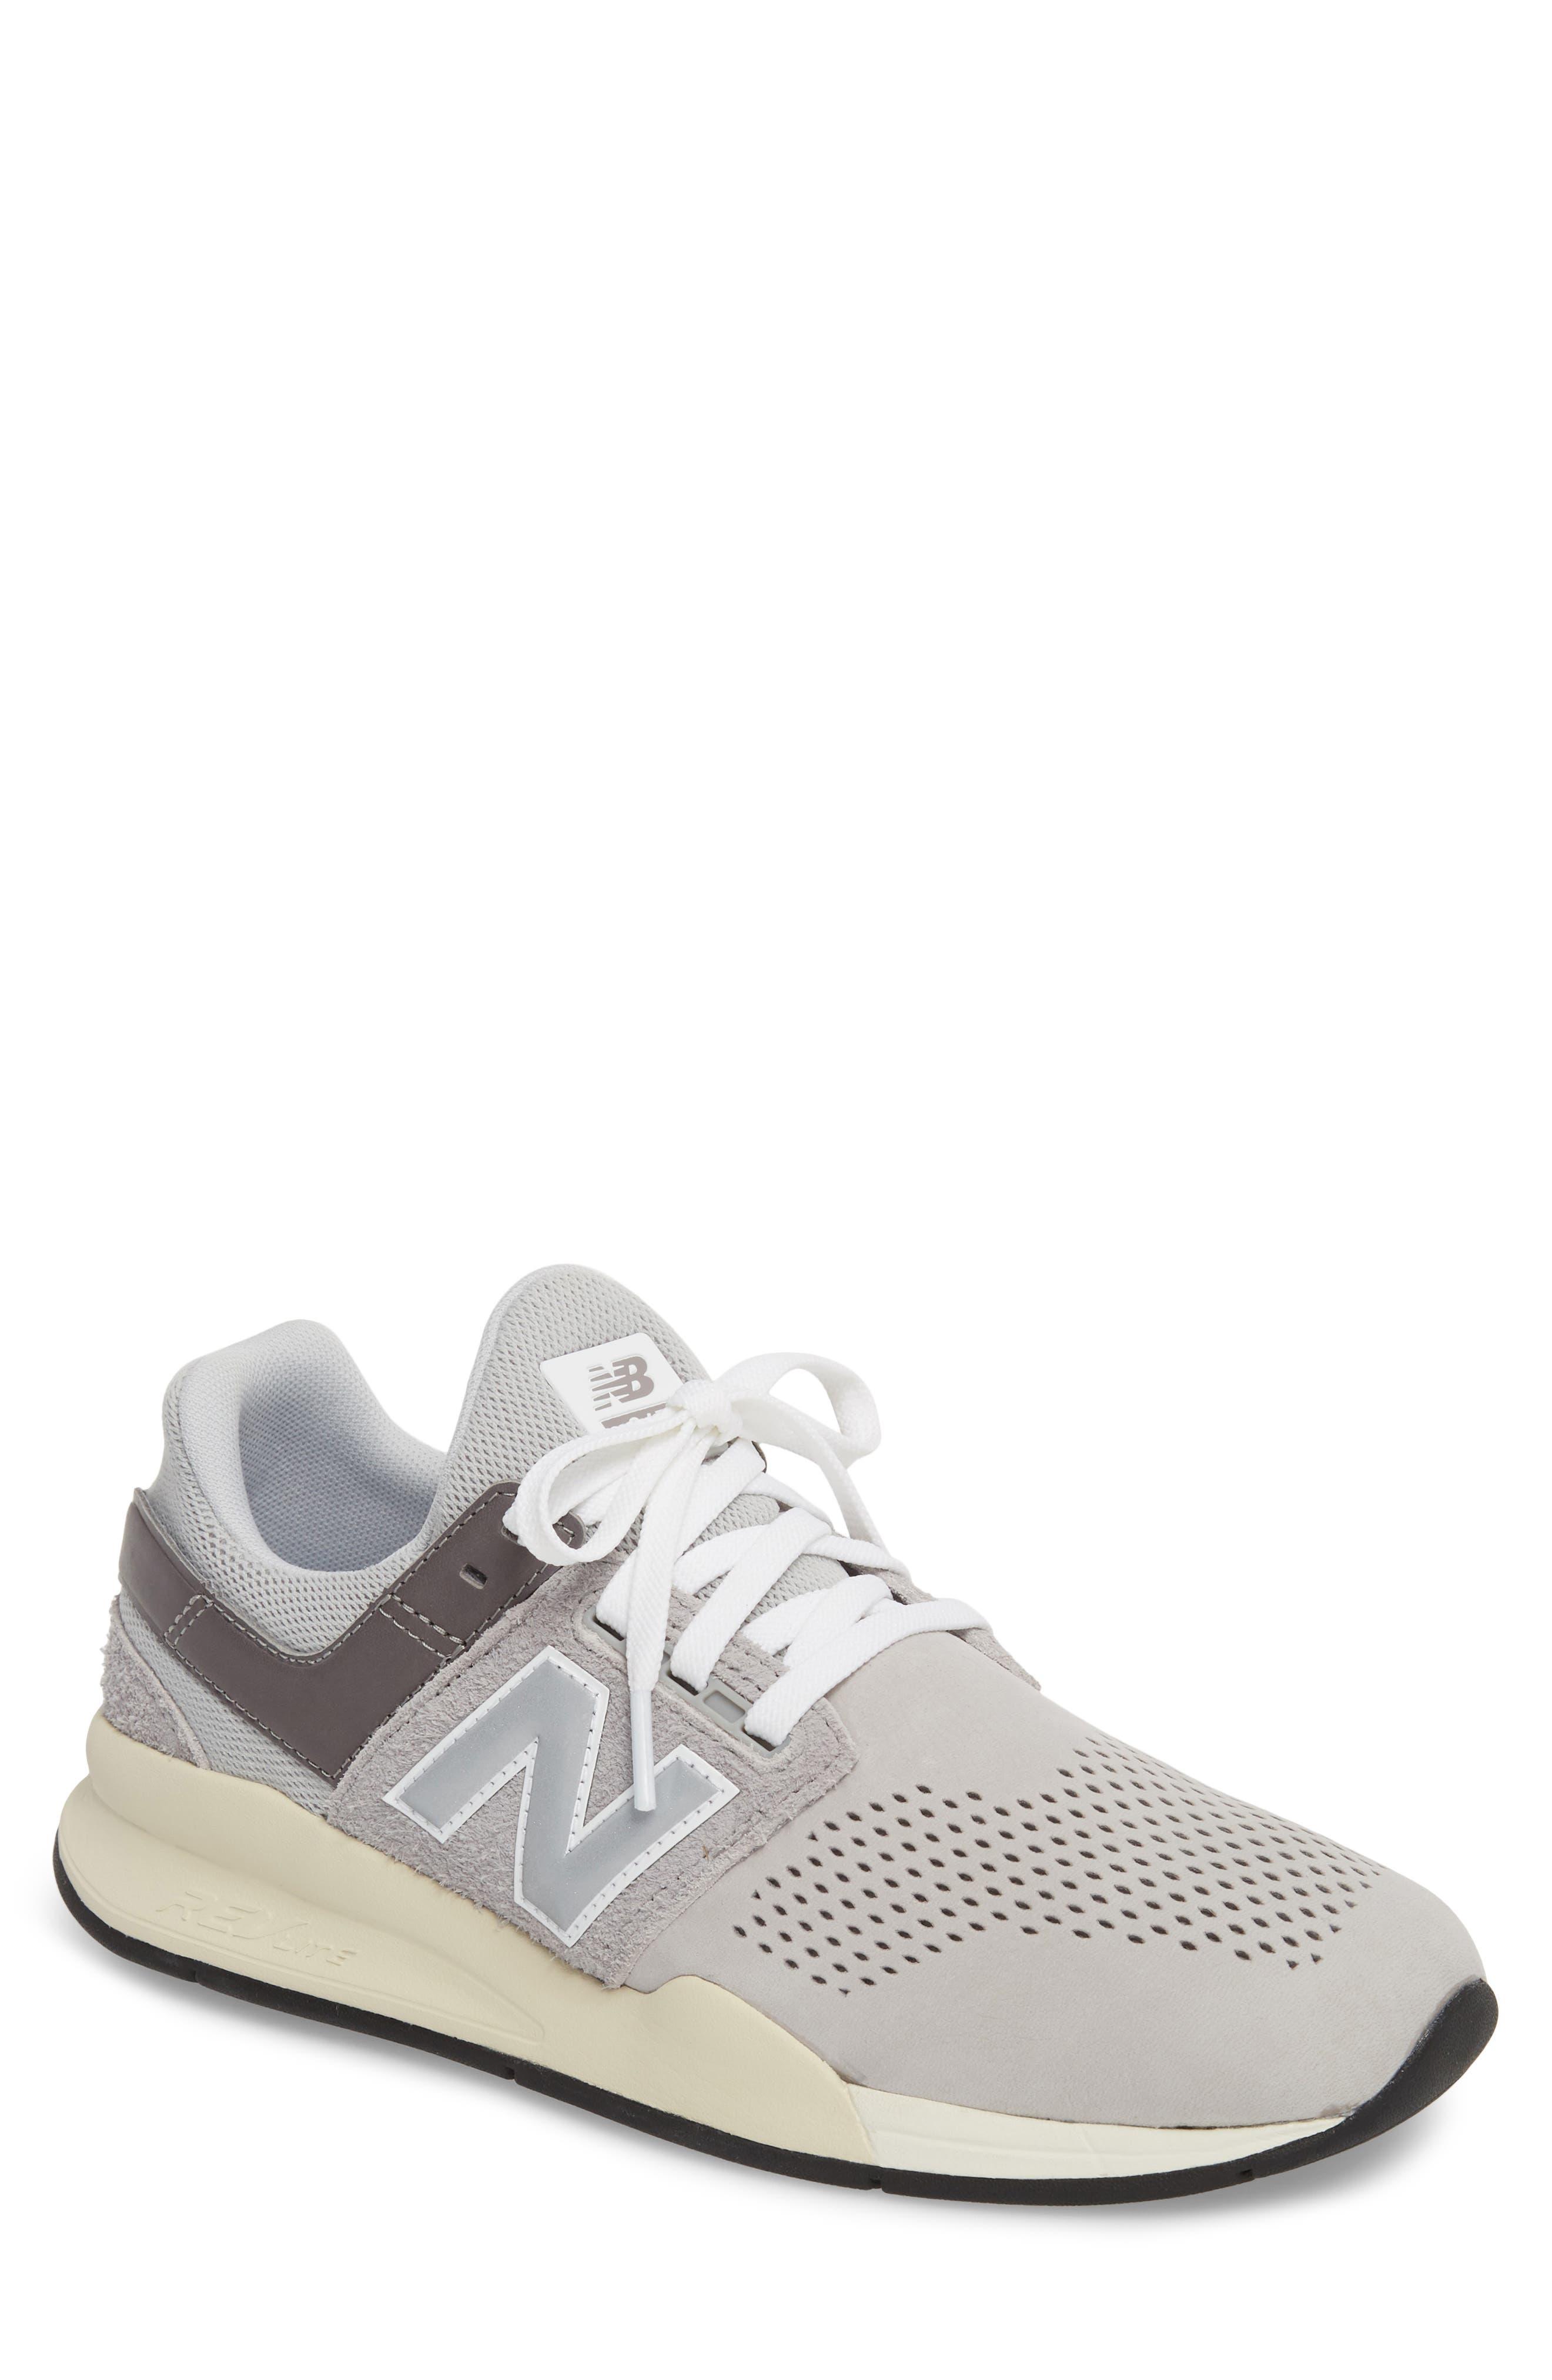 247 v2 Sneaker,                             Main thumbnail 1, color,                             020